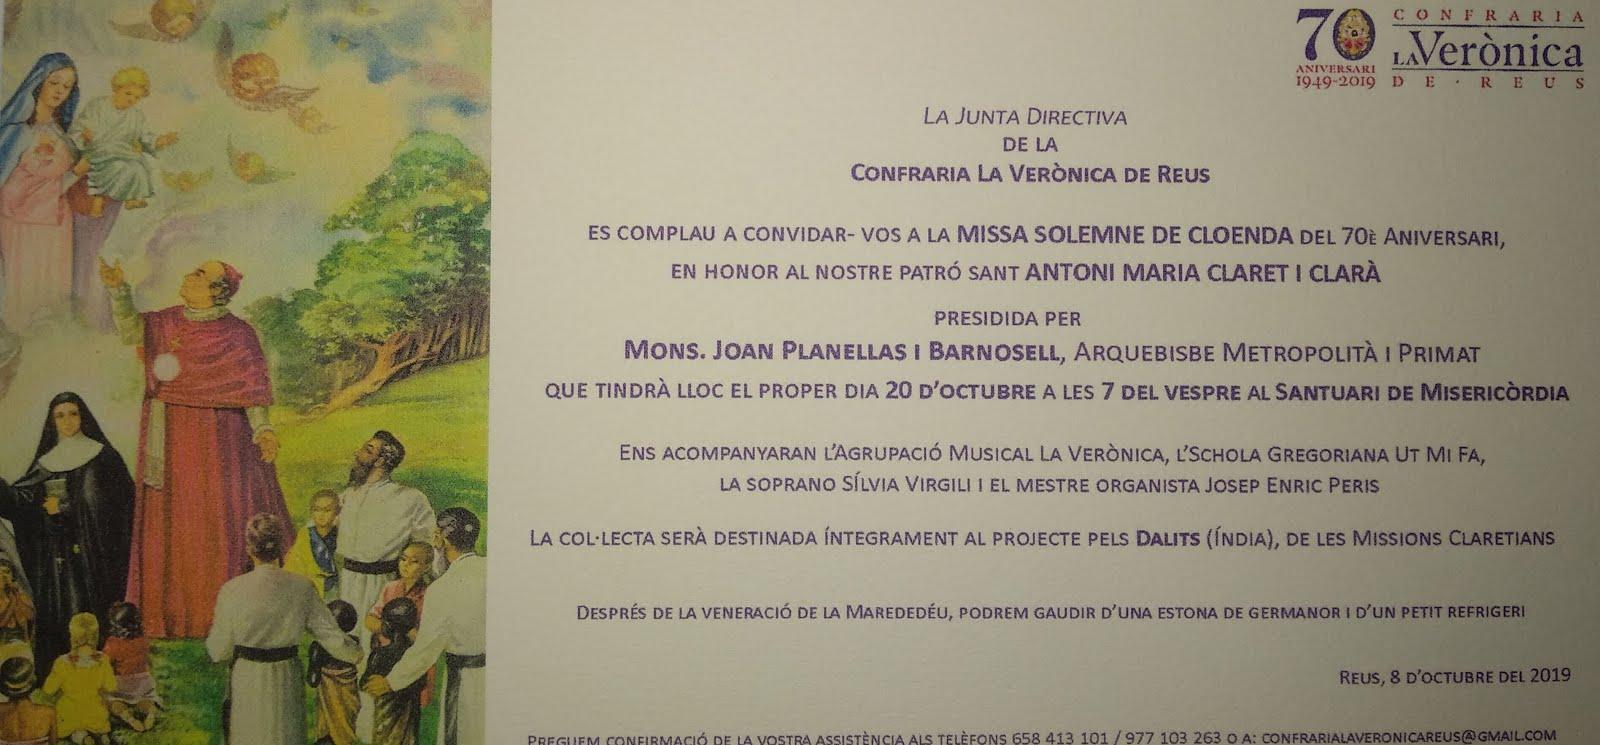 Cloenda del 70 aniversari de la confraria de La Verònica